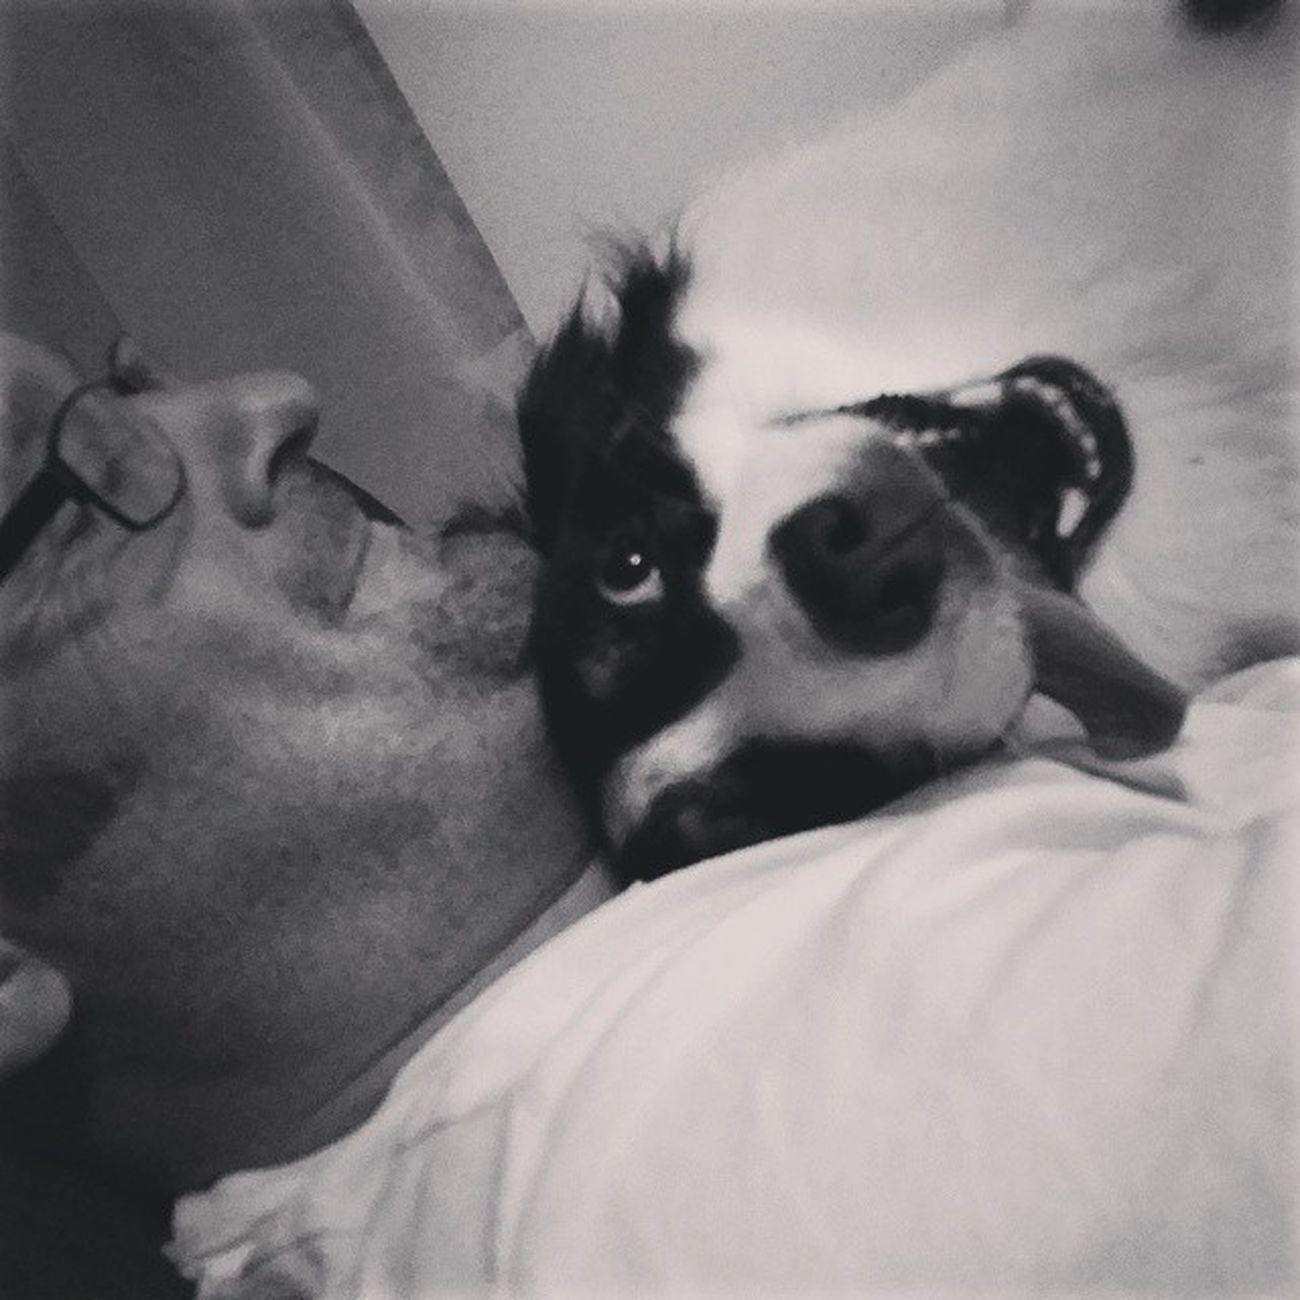 Happy Dogday from @rivergeek and his Derp Lily! Dogsofinstagram Aussiesofinstagram australianshepherd